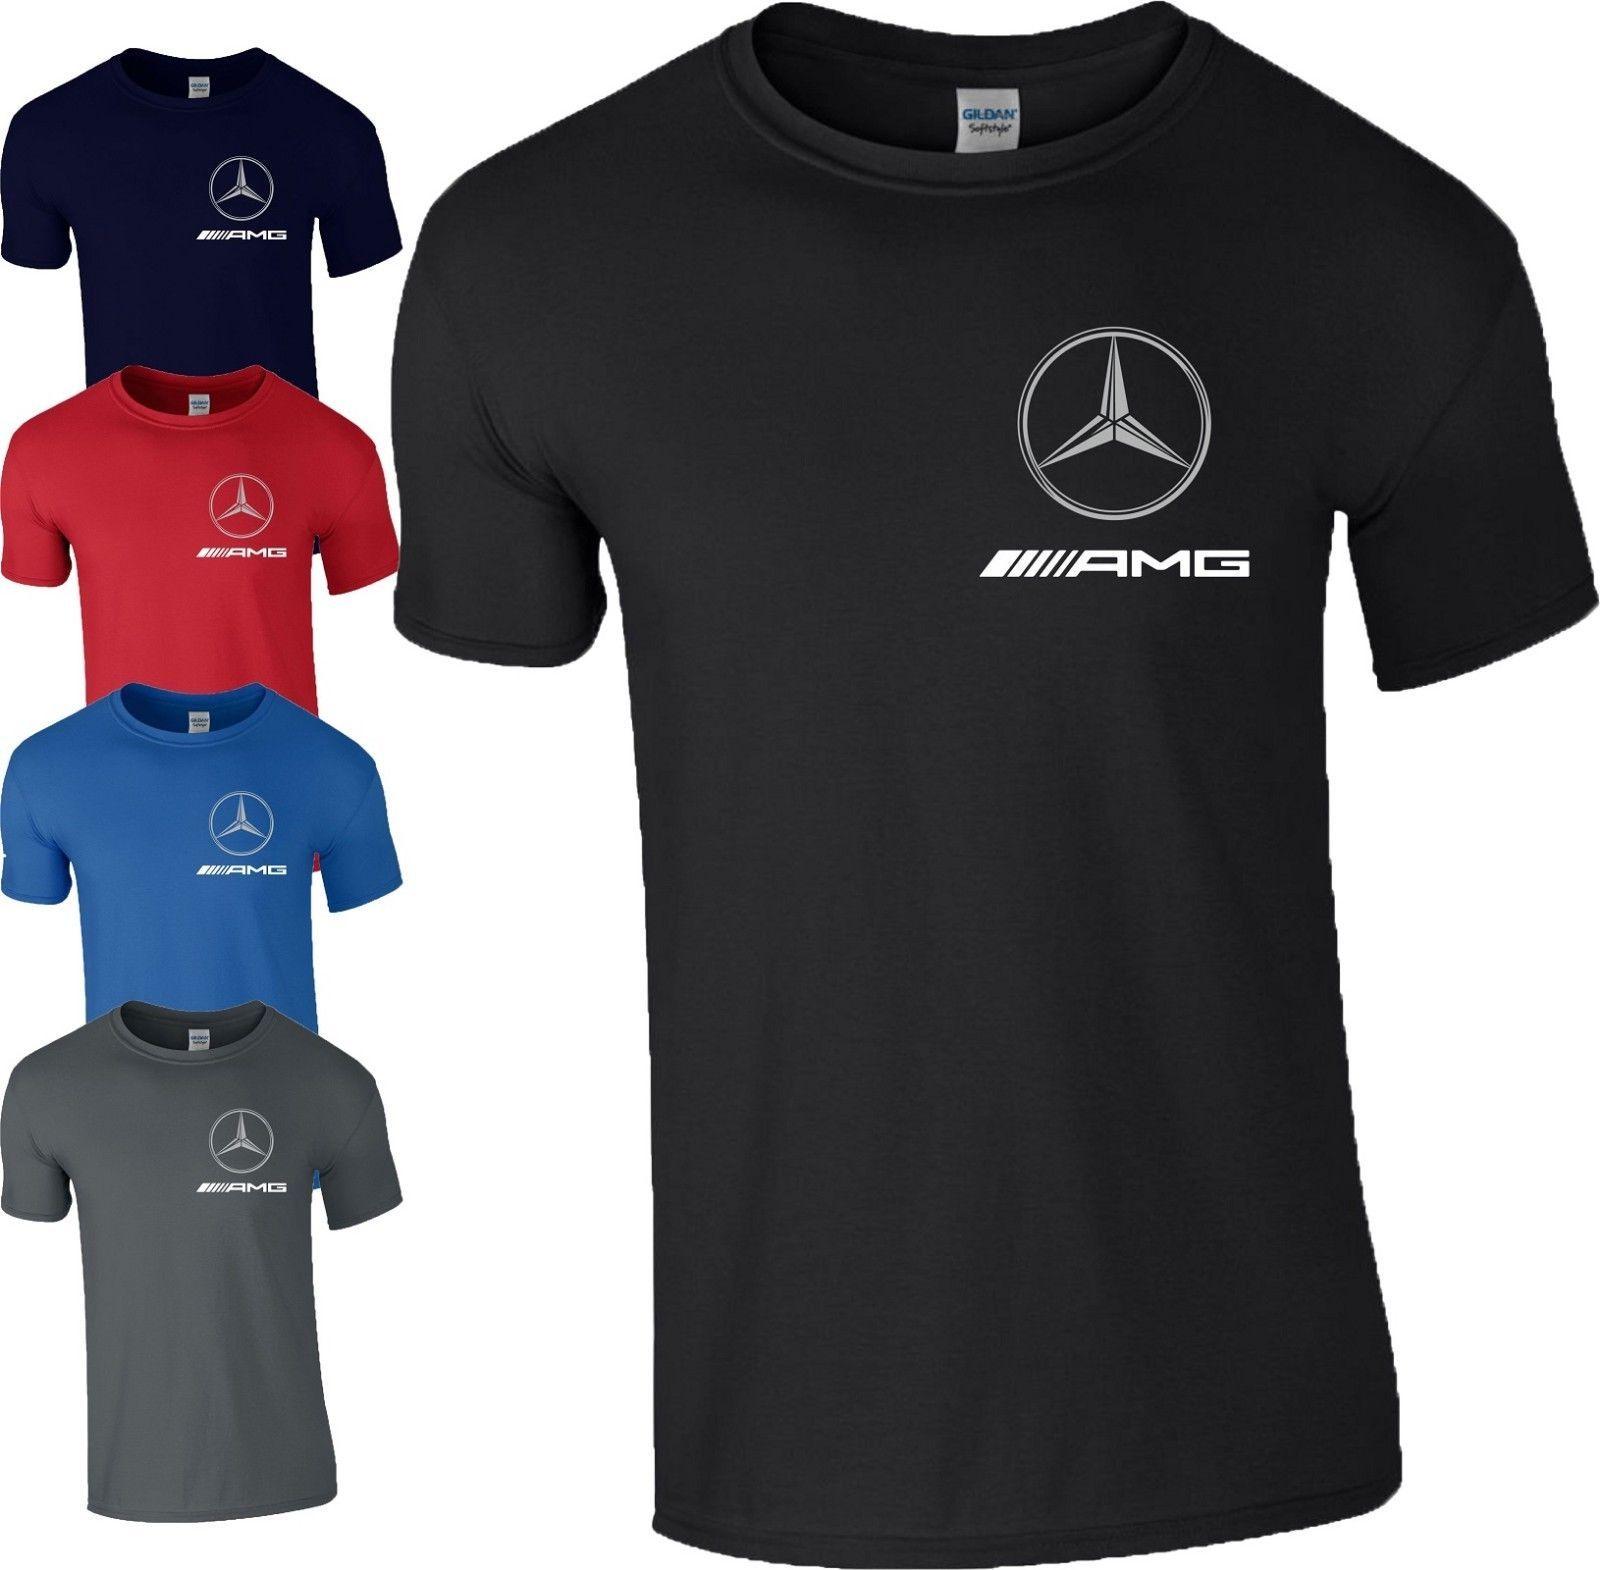 mercedes-amg-logo-t-shirt-f1-formule-1-motorsport.jpg 210050f13b9